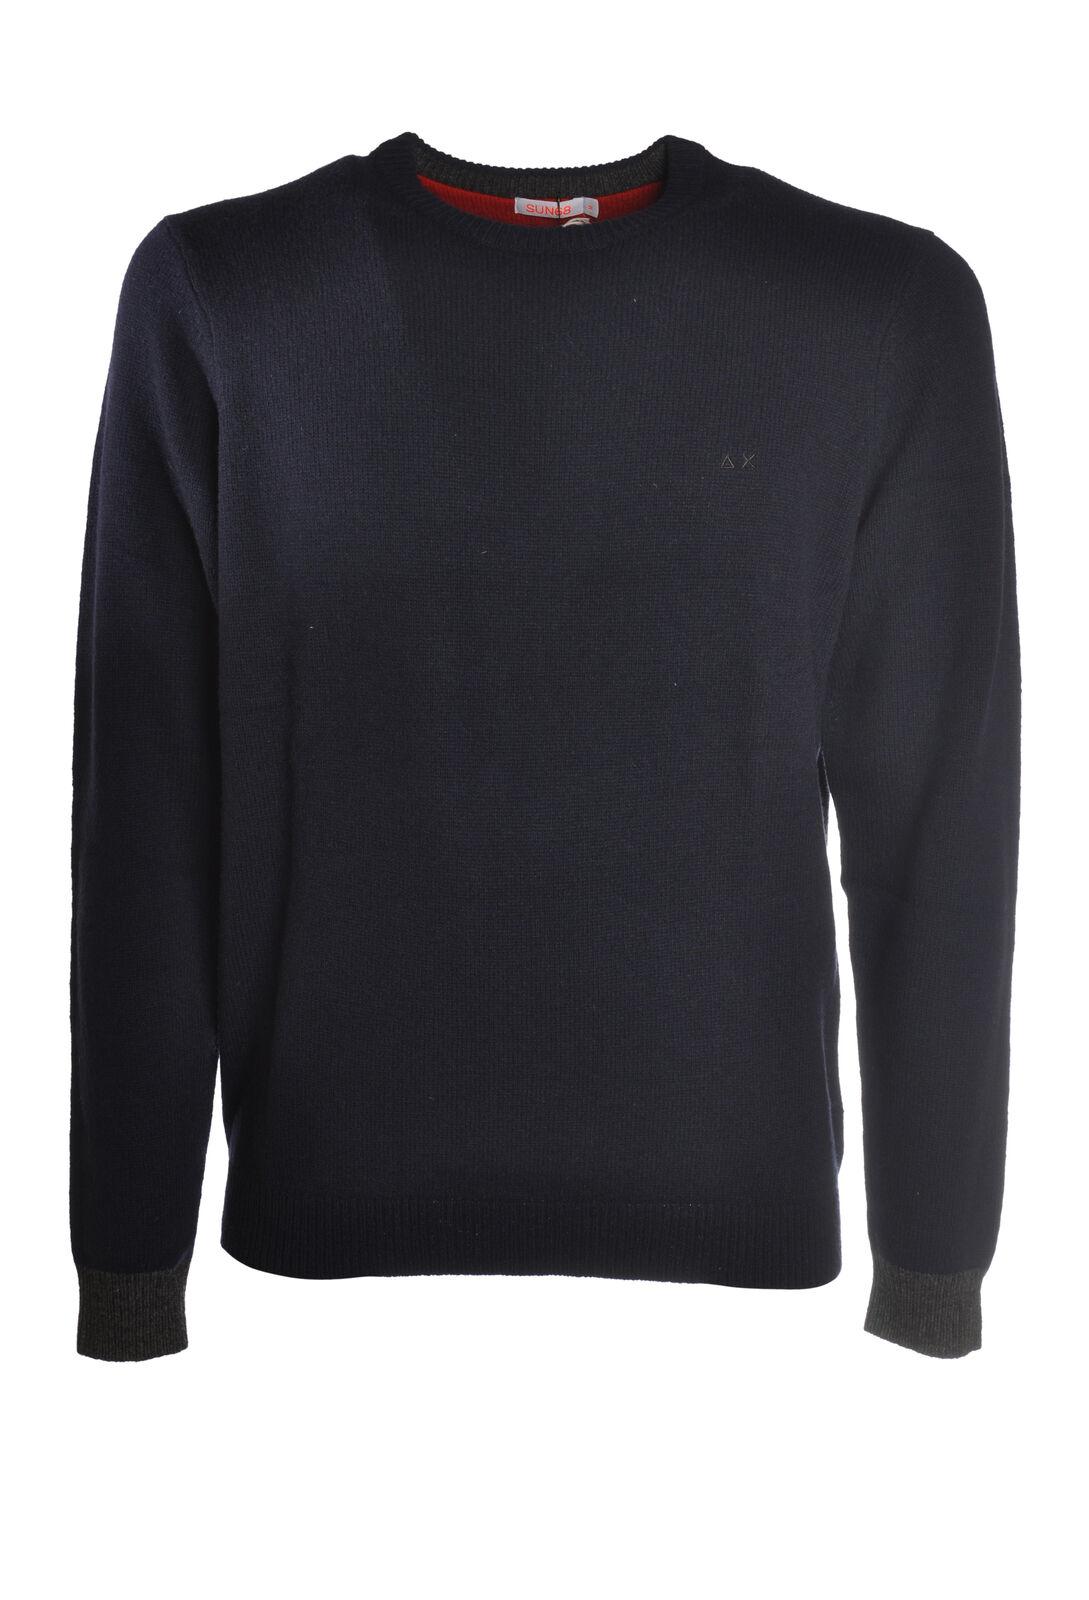 Sun 68 - Knitwear-Sweaters - Man - Blau - 5655309L185657